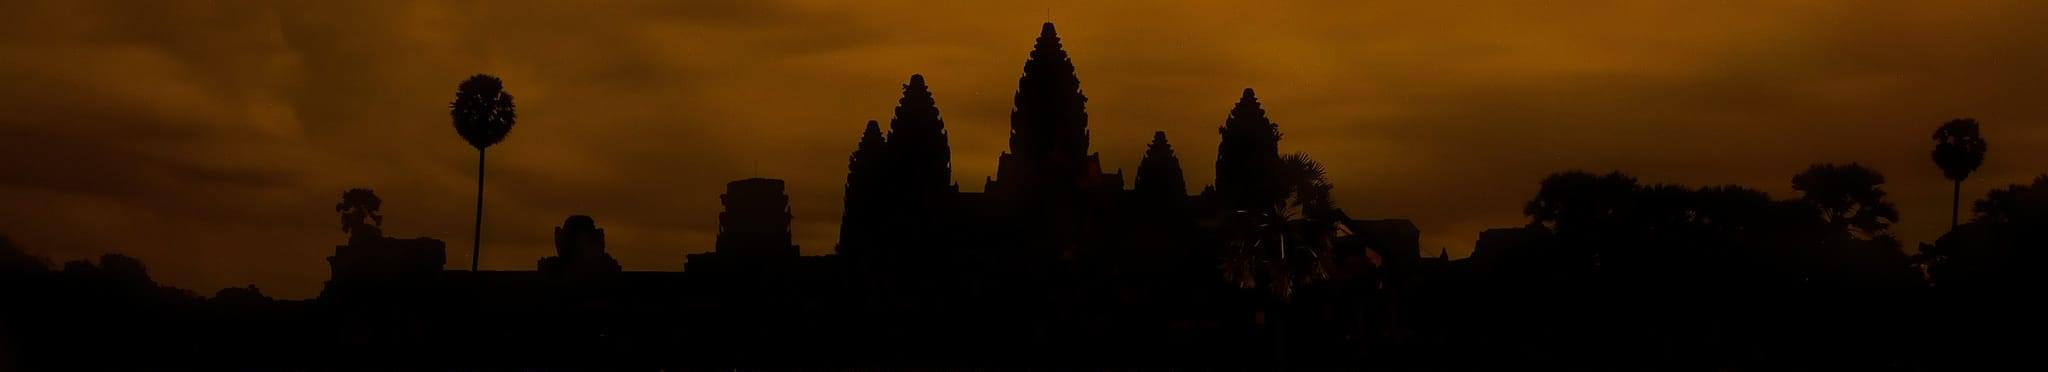 Наследие короля Сурьявармана ІІ:<br>Сием Реап, храмы Ангкора, водопад Кулен, Сием Реап